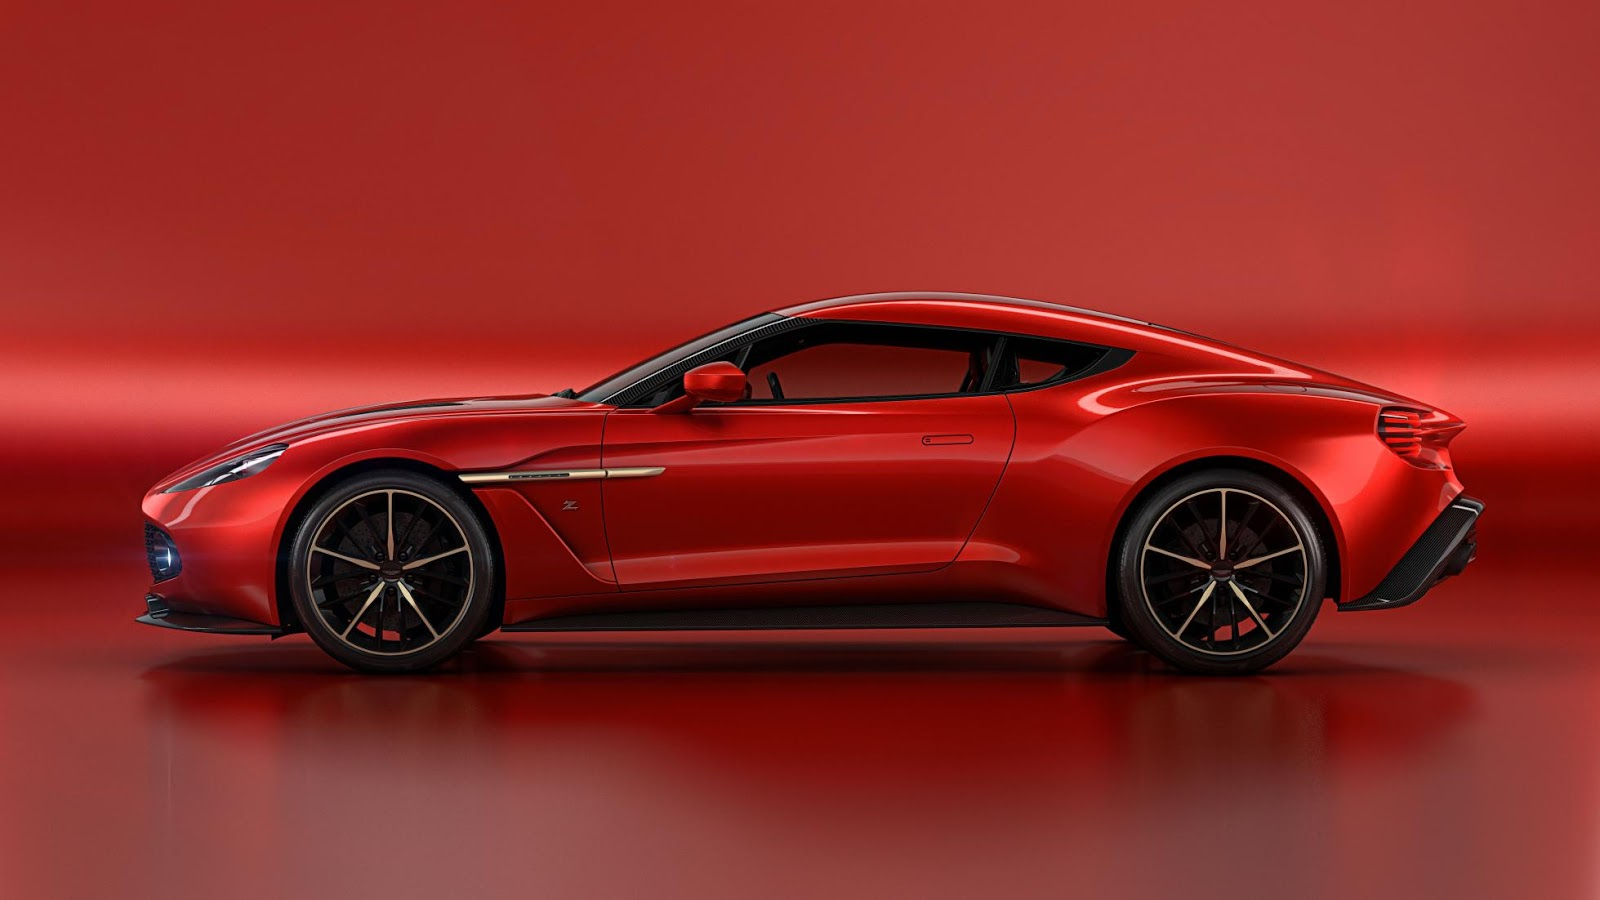 V12 Vanquish Interior 2016 Aston Martin Vanq...